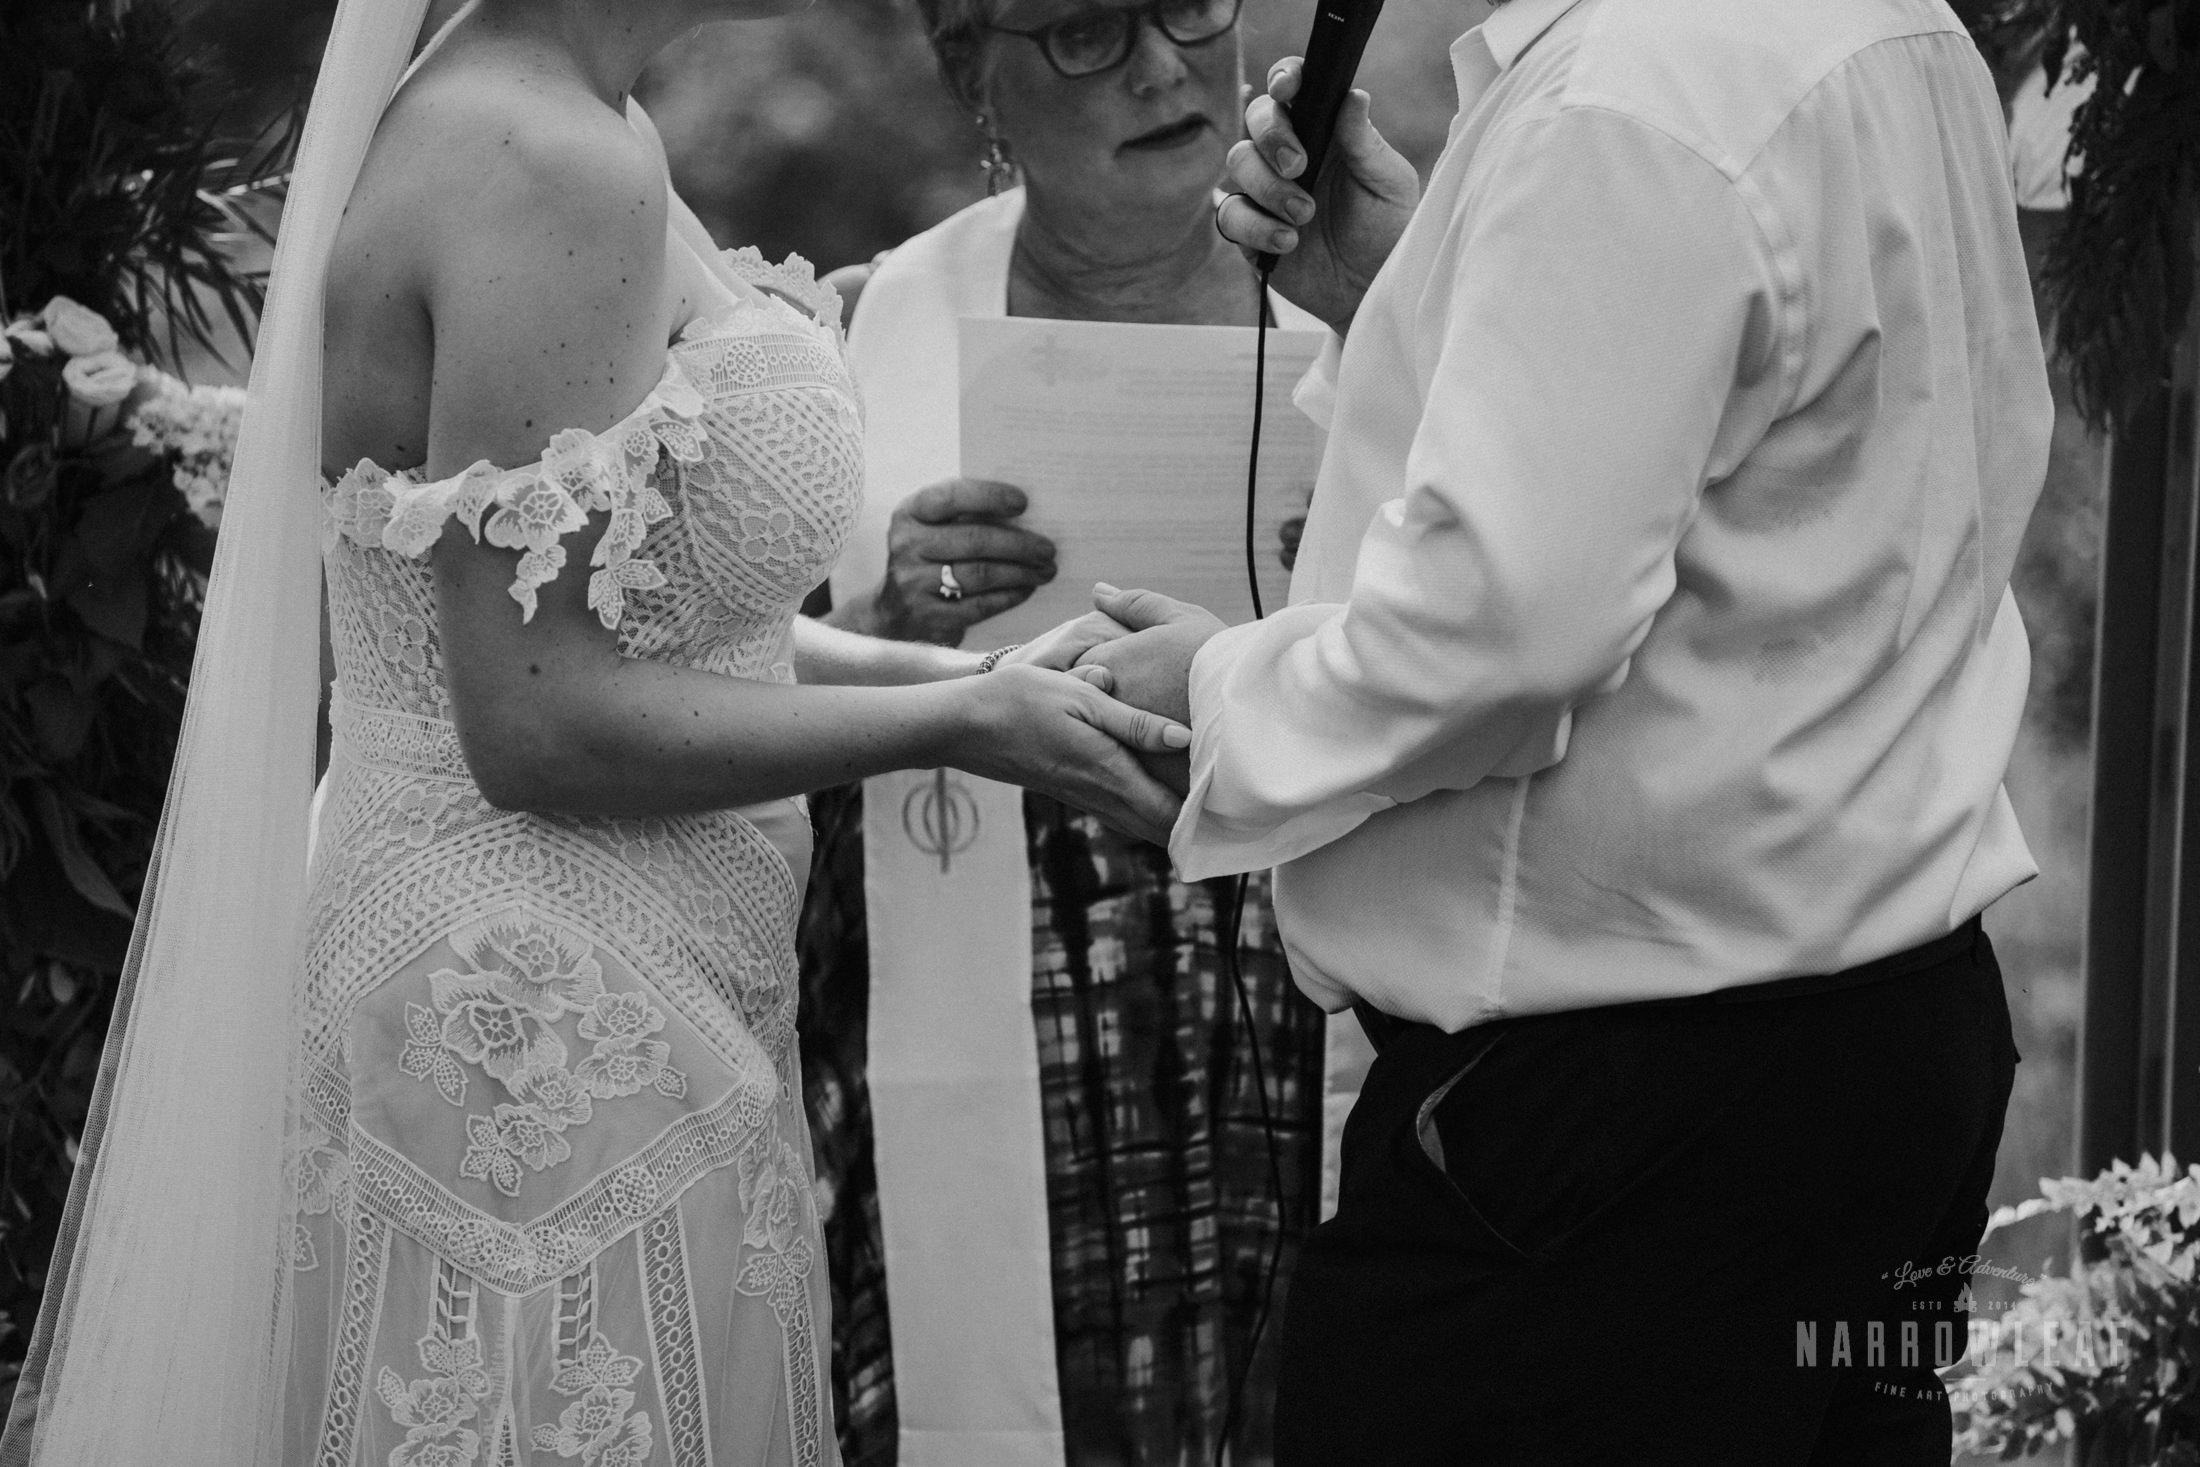 wisconsin-wedding-photographer-Narrowleaf_Love_and_Adventure_Photography-3614.jpg